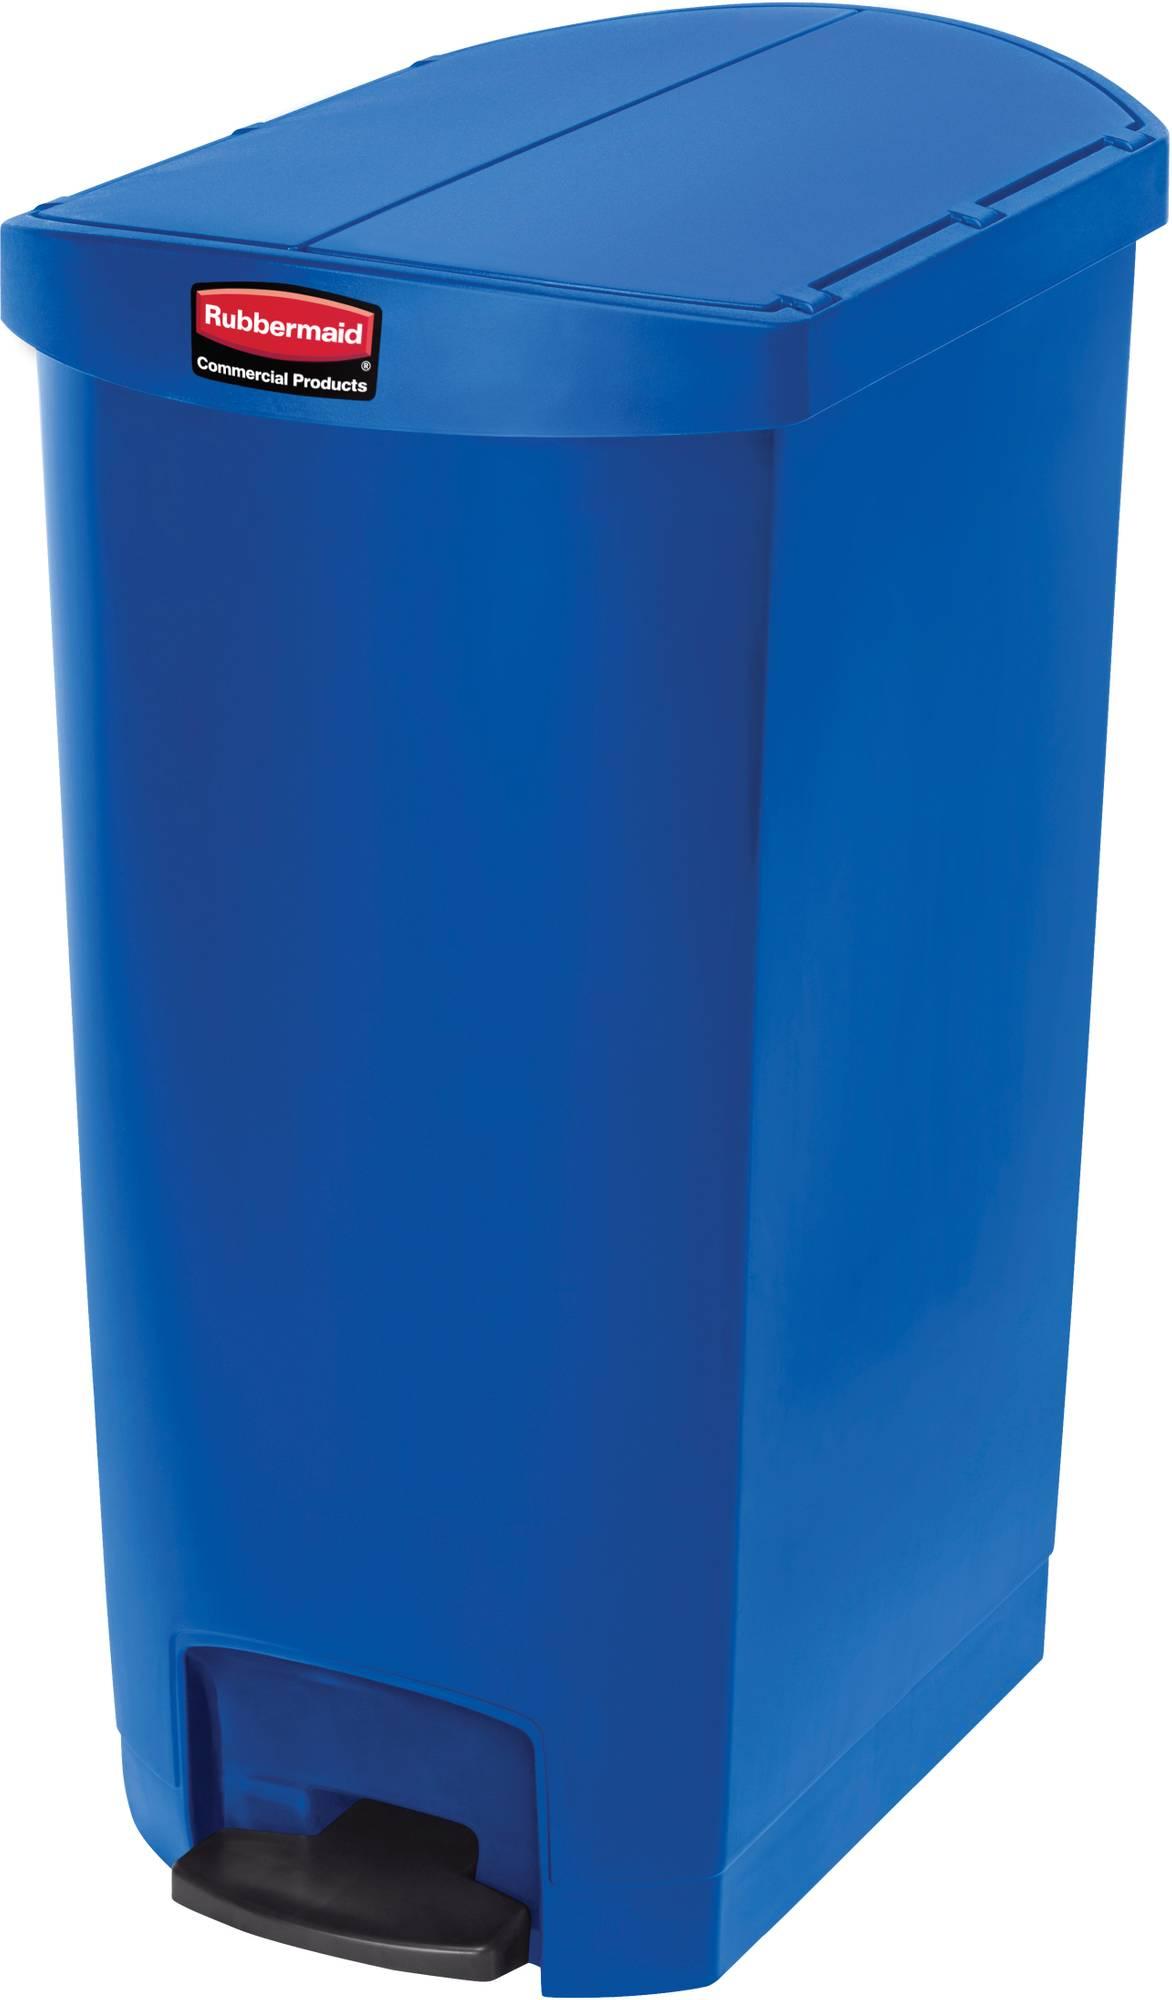 Rubbermaid Slim Jim Step On Container, End Step mit 68 Liter Füllmenge in Blau